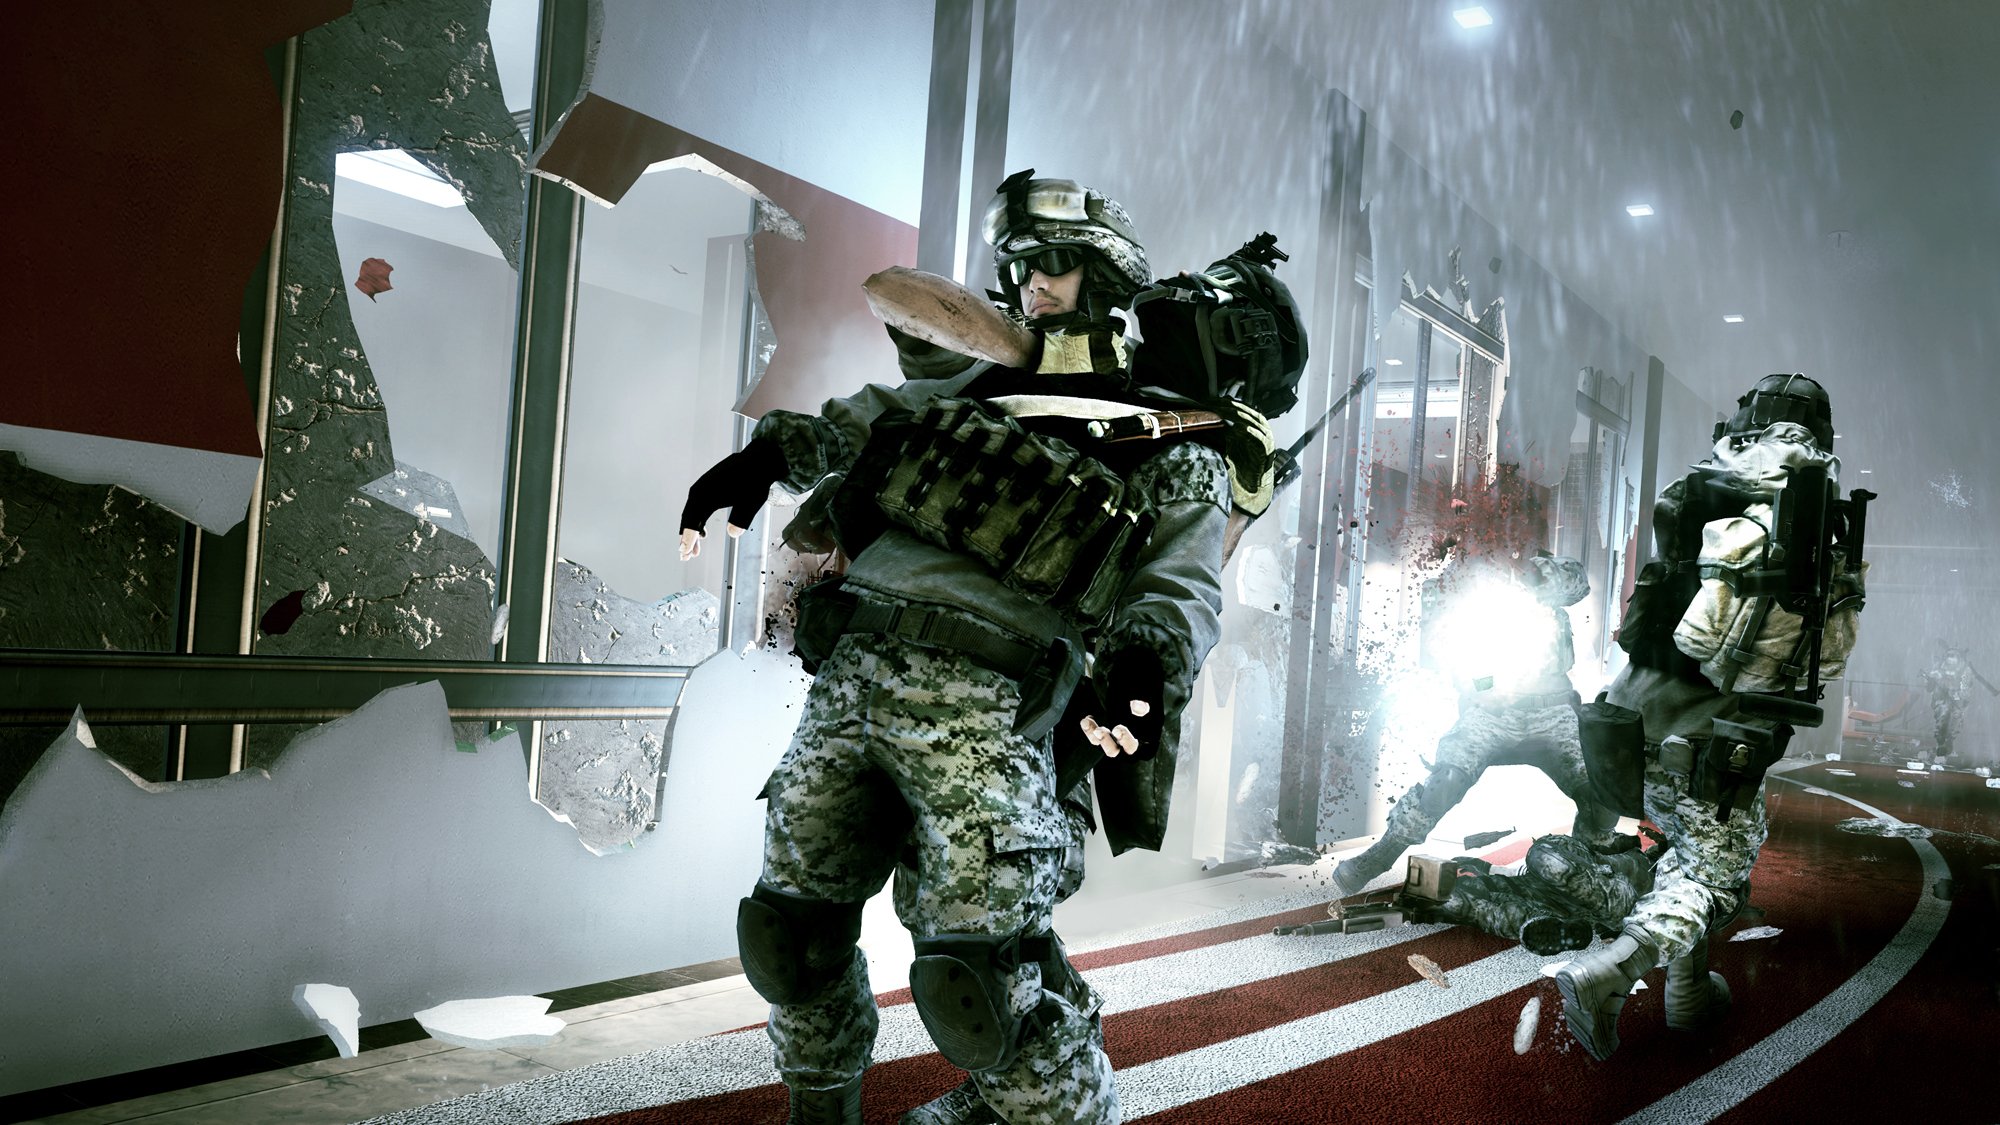 Battlefield 3 unveils Close Quarters Trailer and upcoming DLC